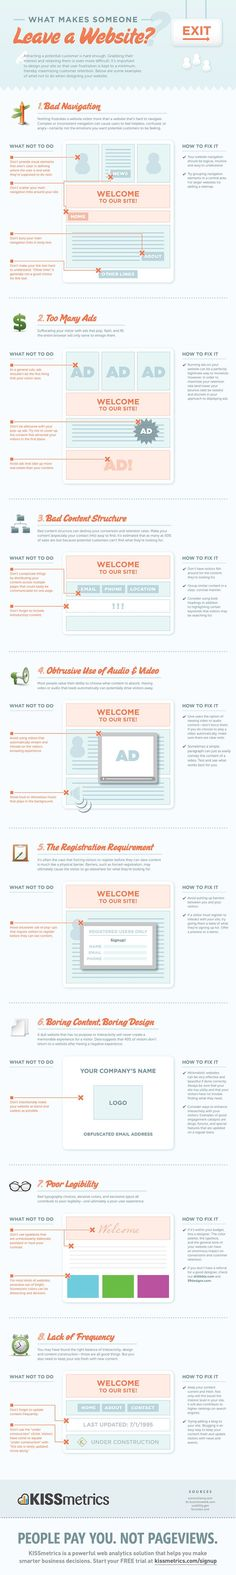 As long as a Blog puede llegar a ser Social Marketing en una Enterprise, podemos sacar good information de este Infographic. No ests interested to know porqu la people abandona tu Website?  #infographics